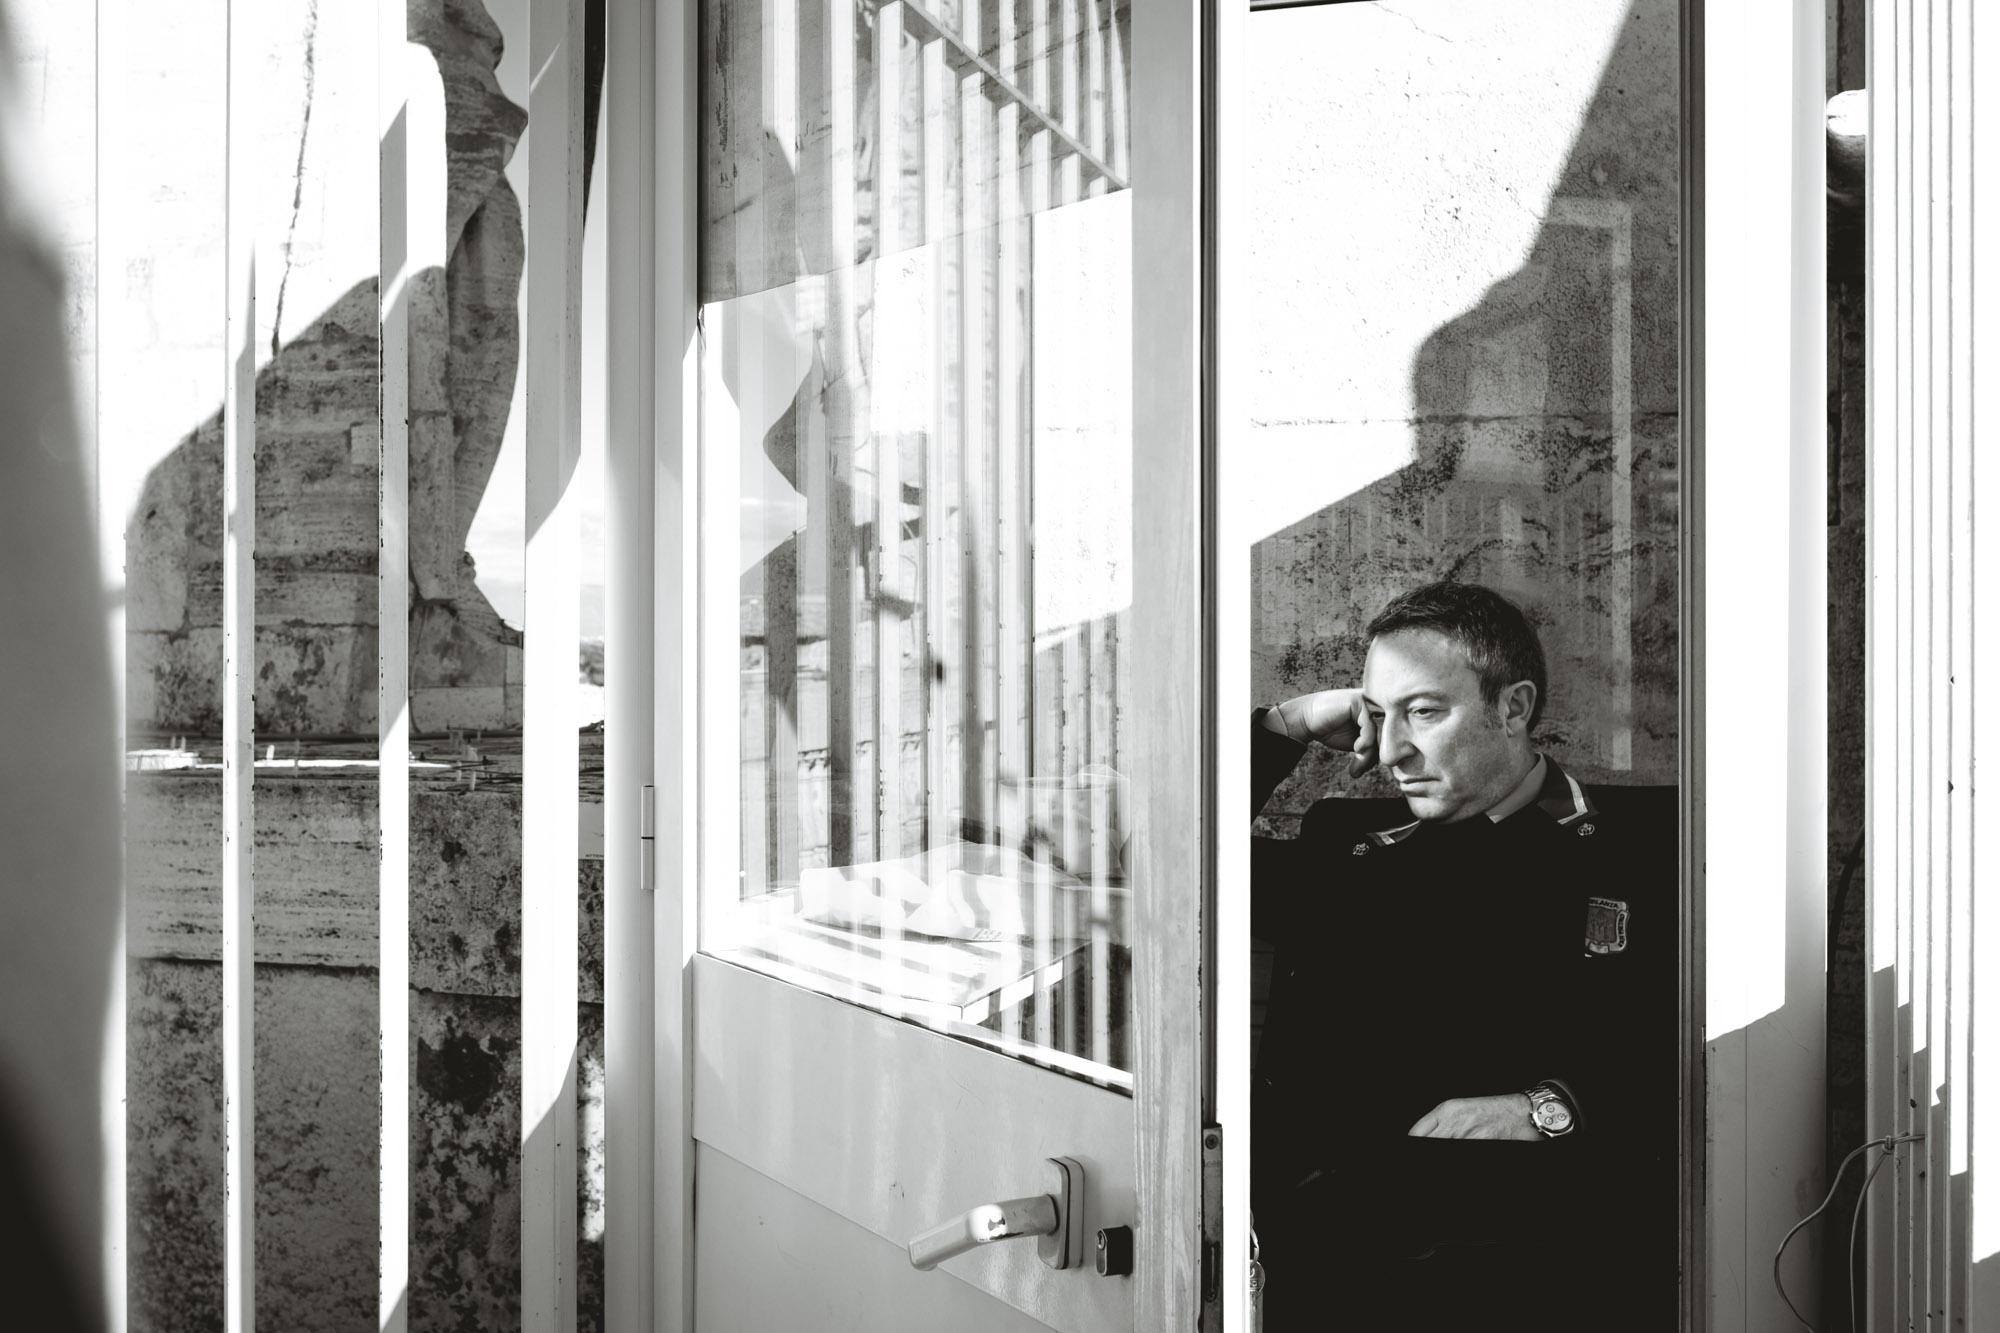 Vatican City Security Guard Sleeping